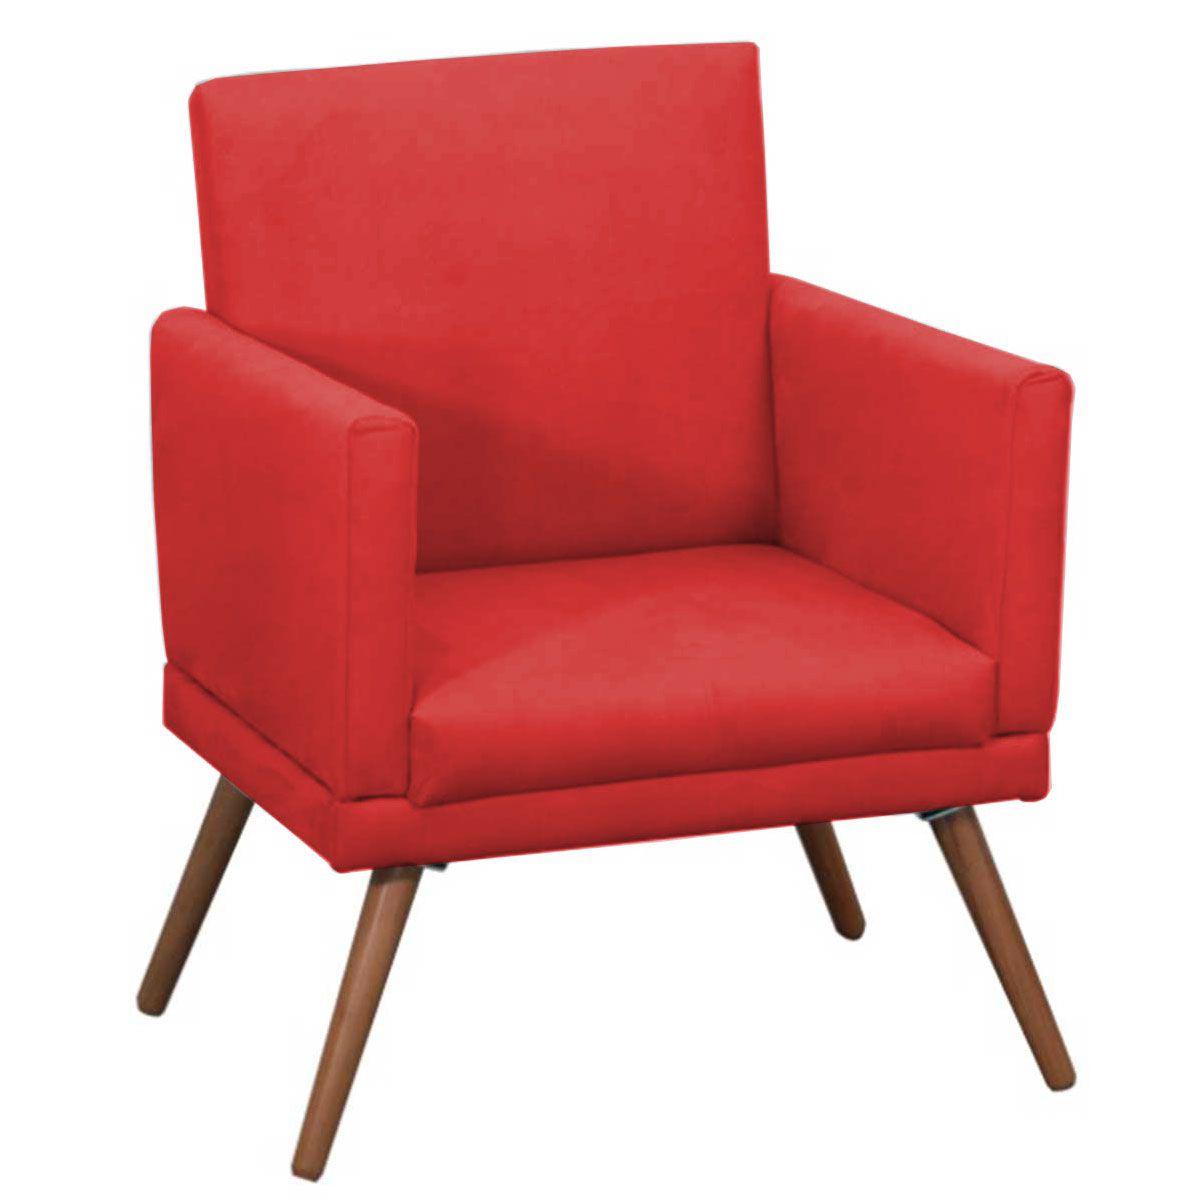 Poltrona Decorativa New Nina Luxo Pé Palito Tecido Vermelho